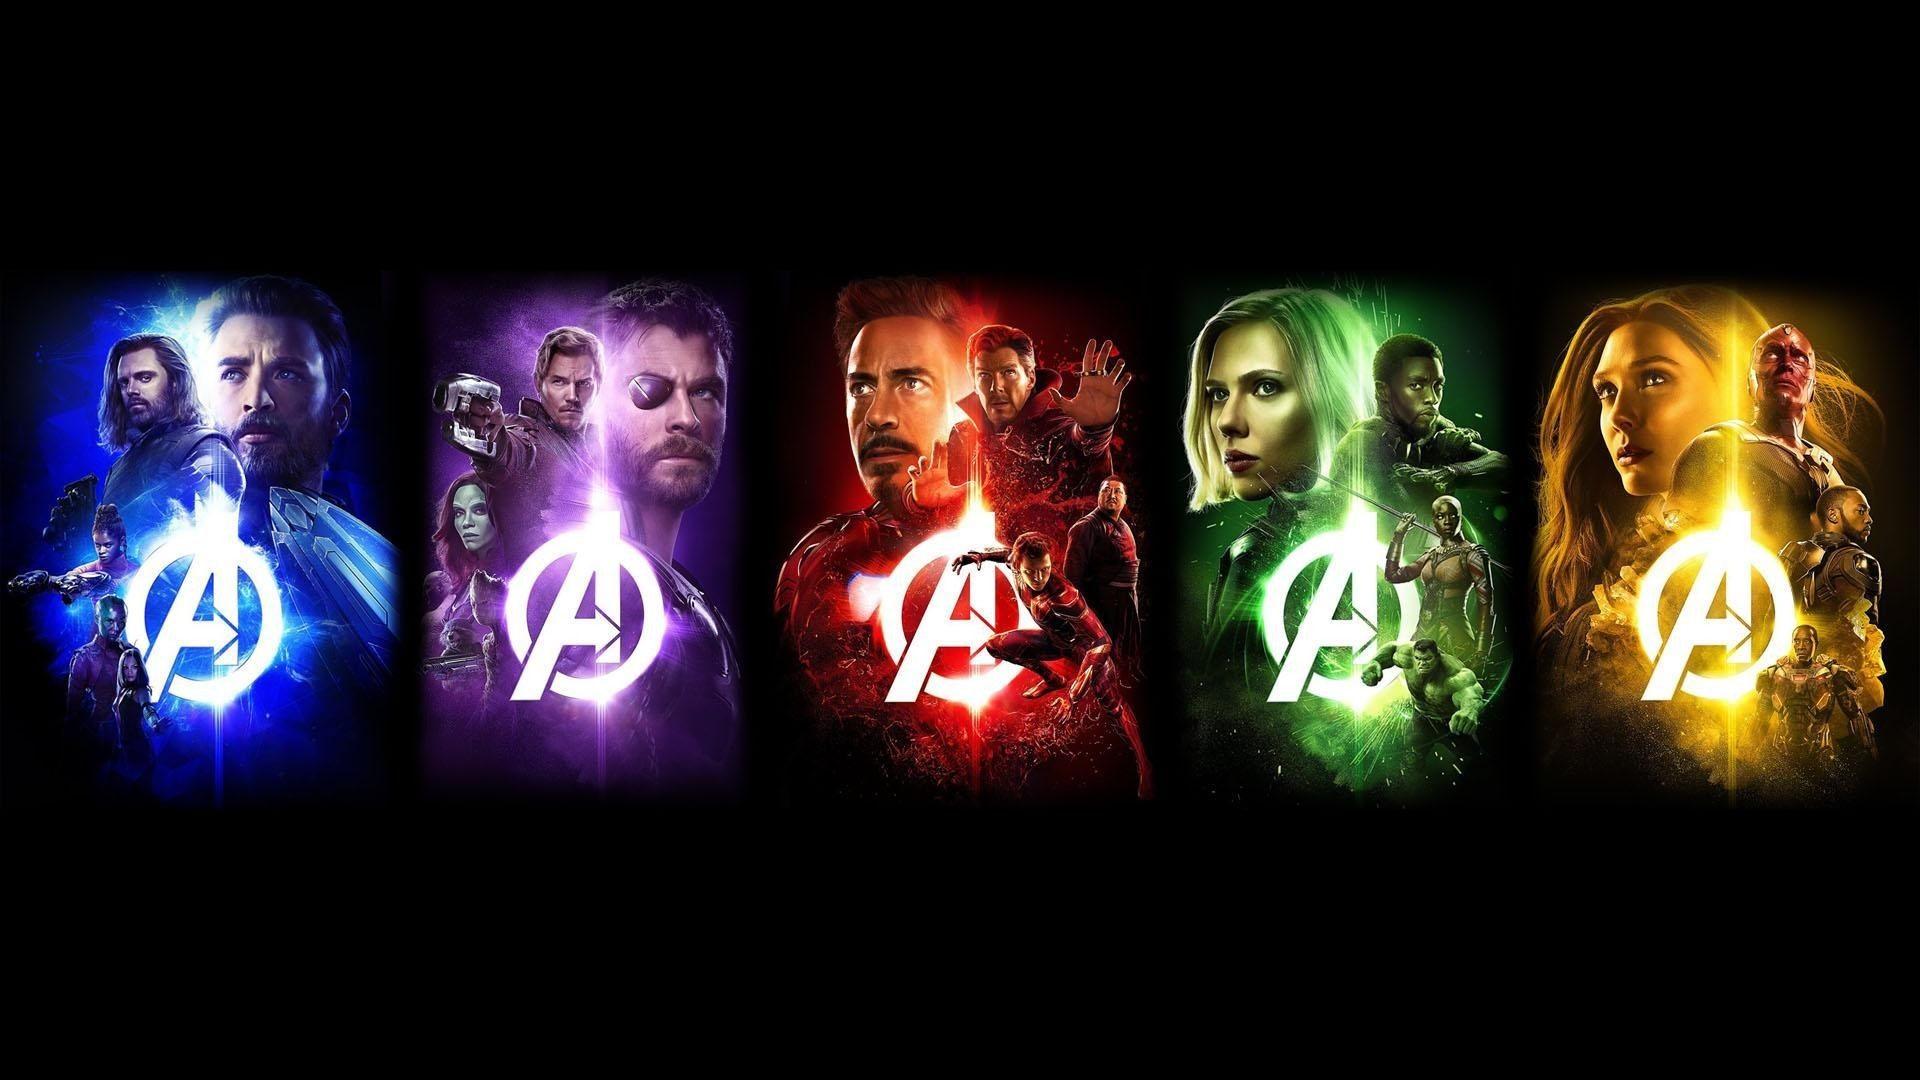 Avengers Infinity War Wallpaper Hd Best Hd Wallpapers